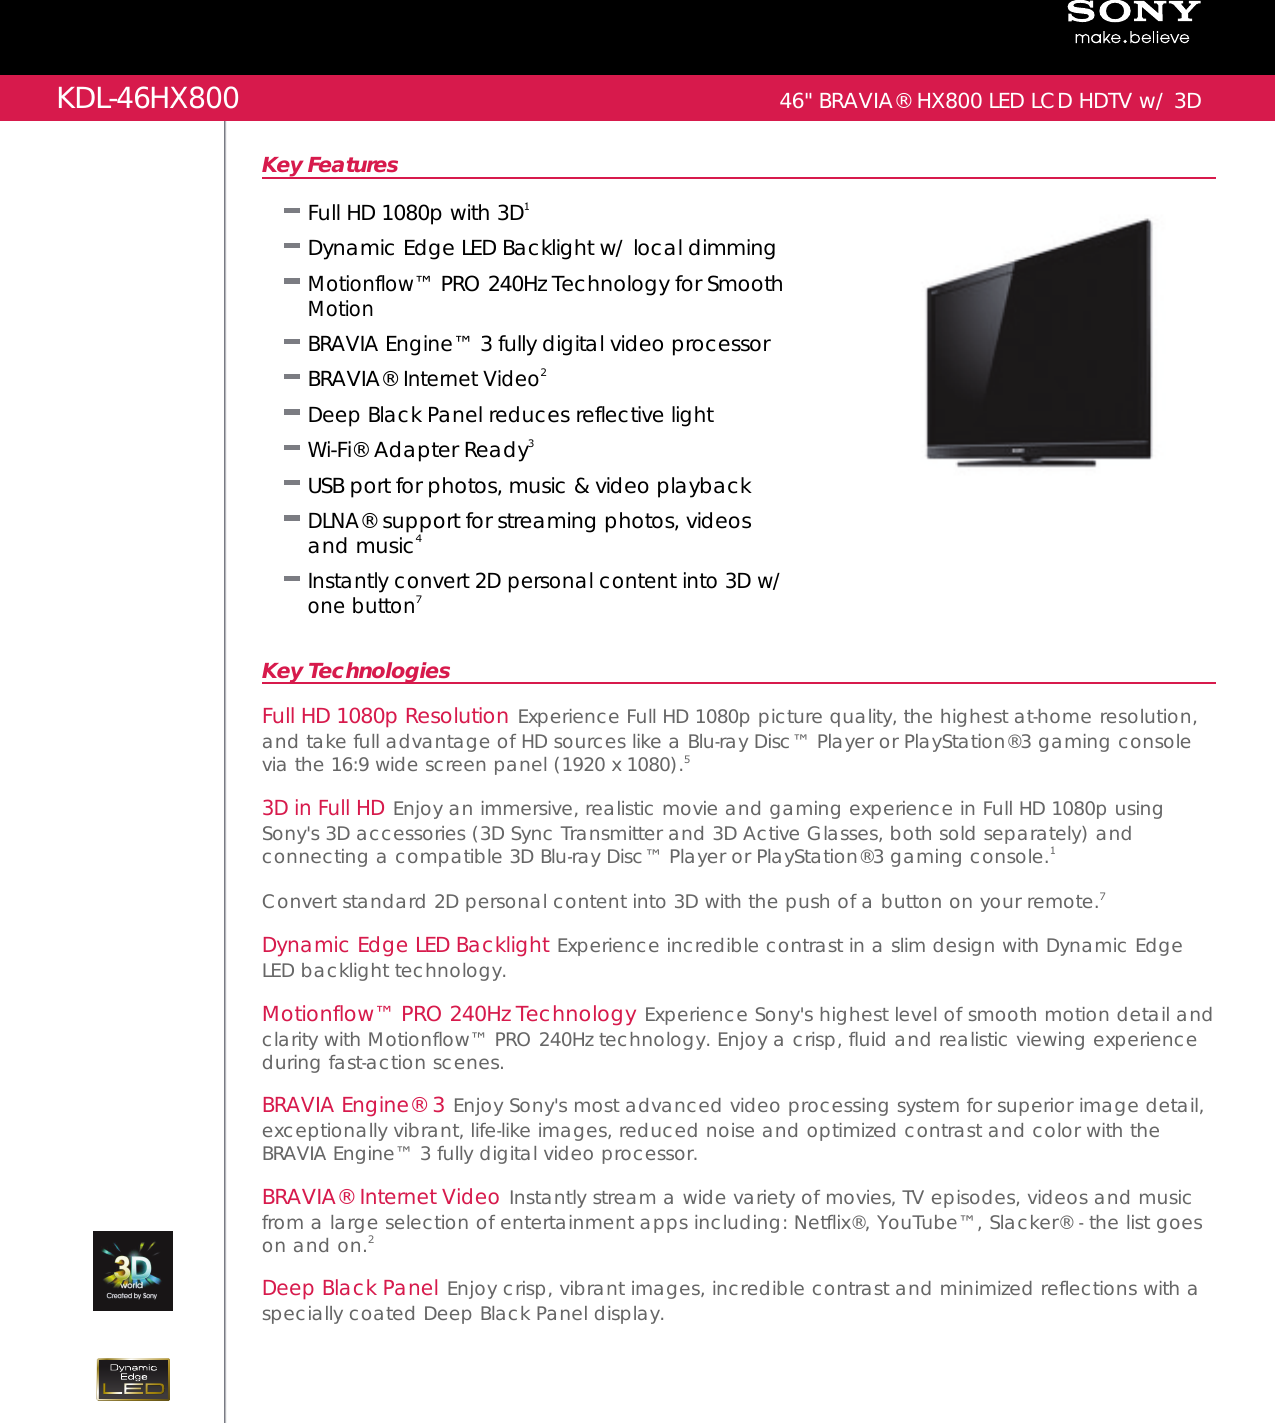 sony kdl 46hx800 user manual marketing specifications kdl46hx800 mksp rh usermanual wiki sony bravia kdl-46hx800 user manual sony bravia kdl-46hx800 manual